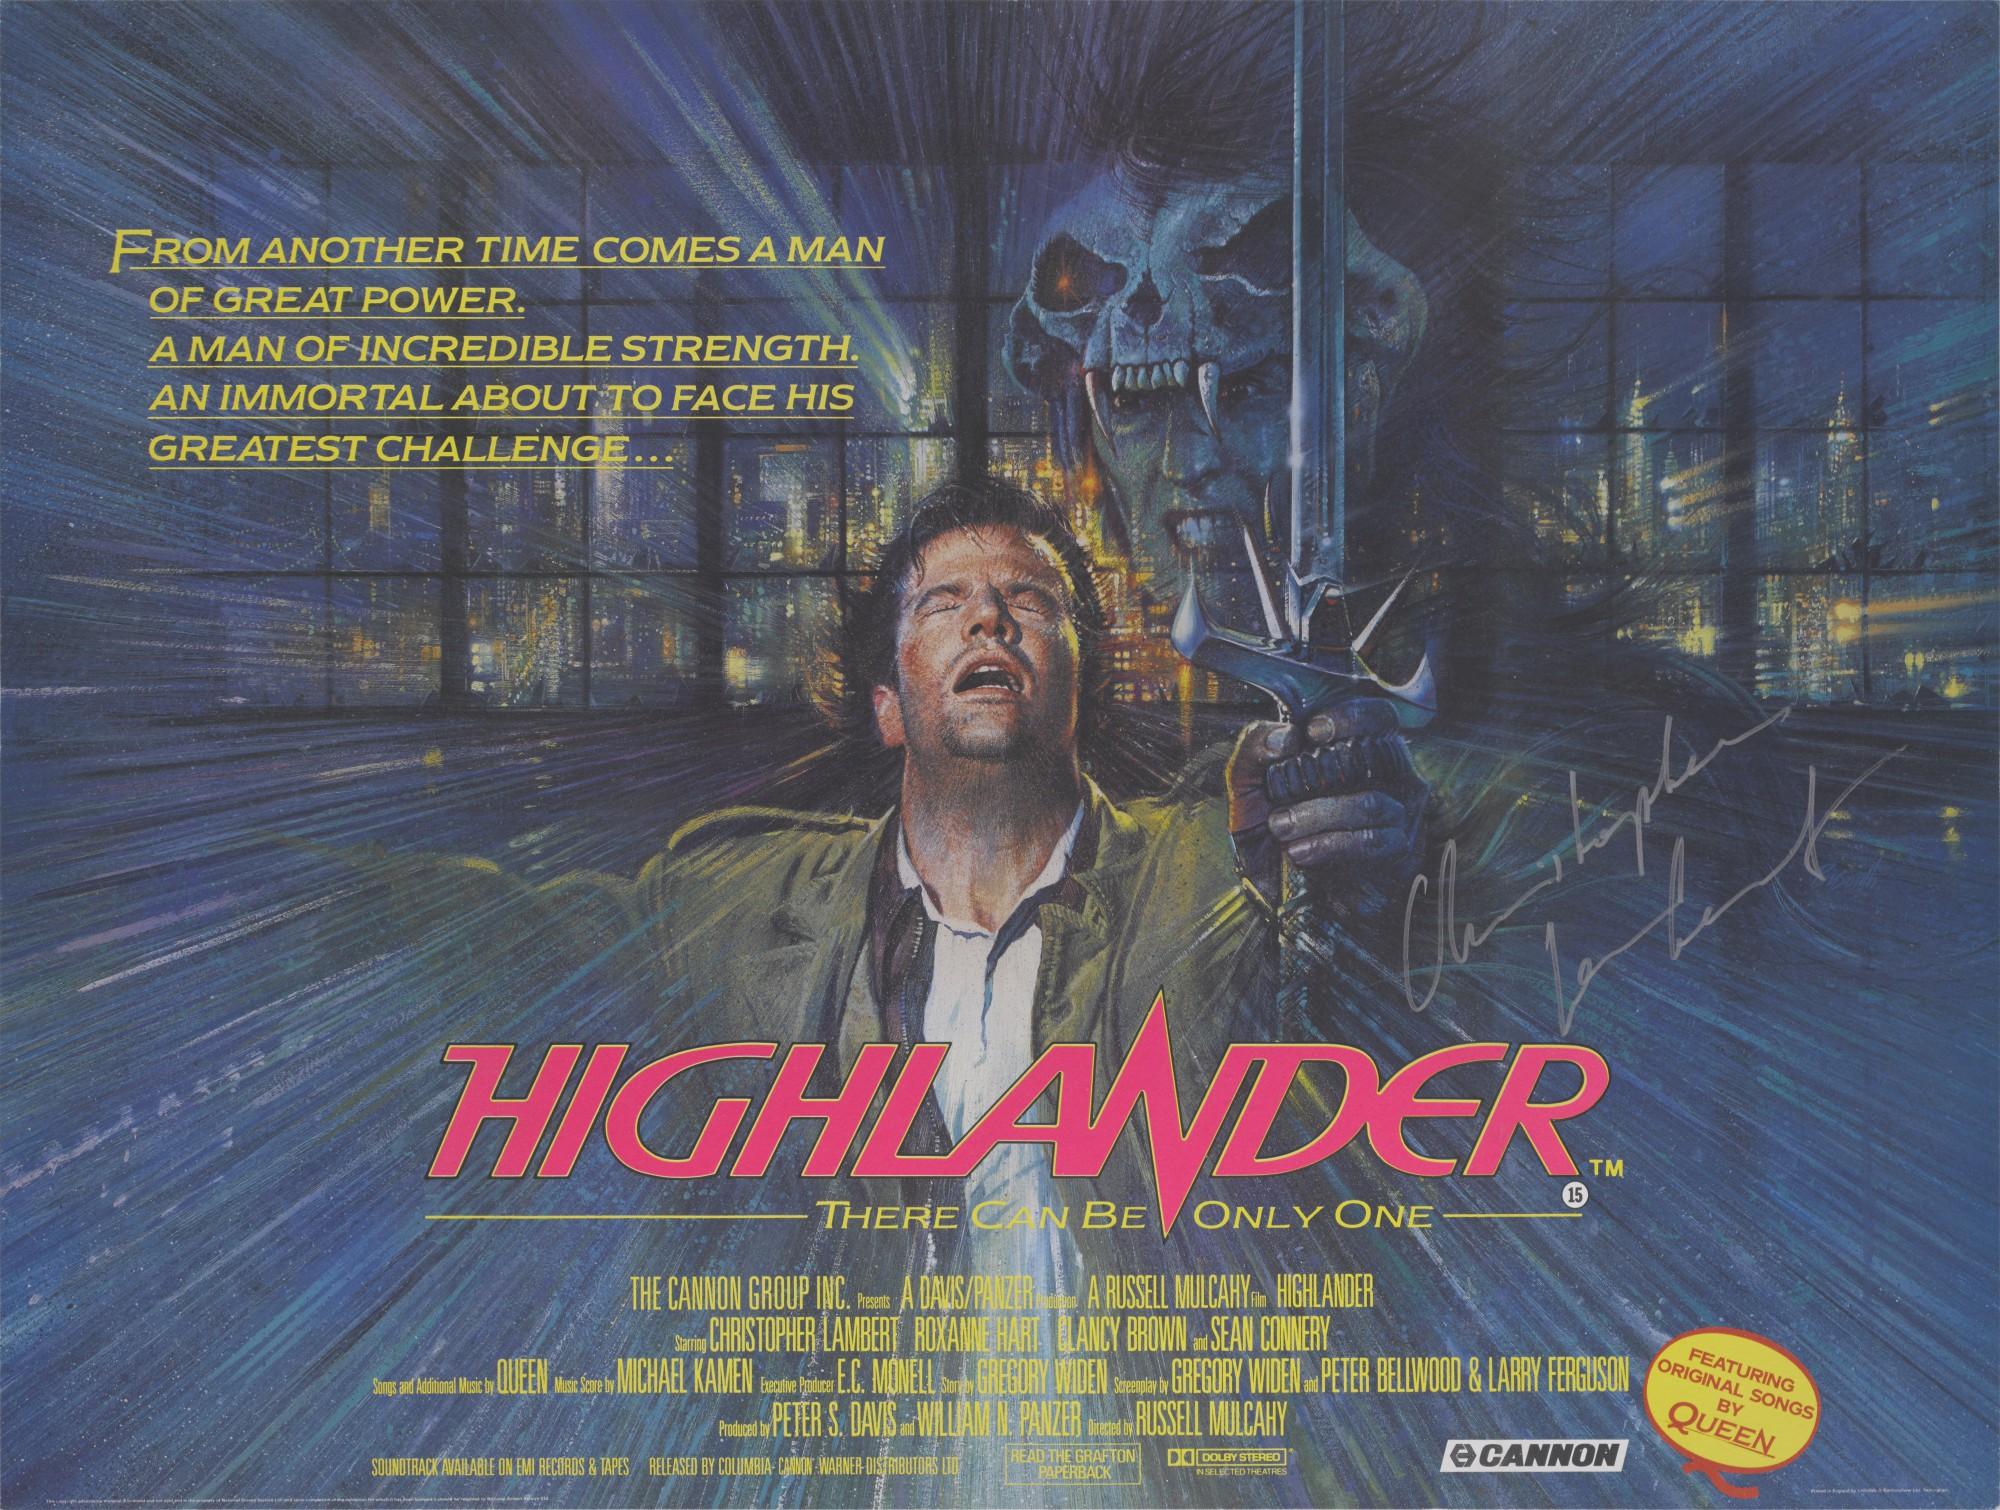 HIGHLANDER (1986) POSTER, BRITISH, SIGNED BY CHRISTOPHER LAMBERT   Original Film  Posters Online2020   Sotheby's